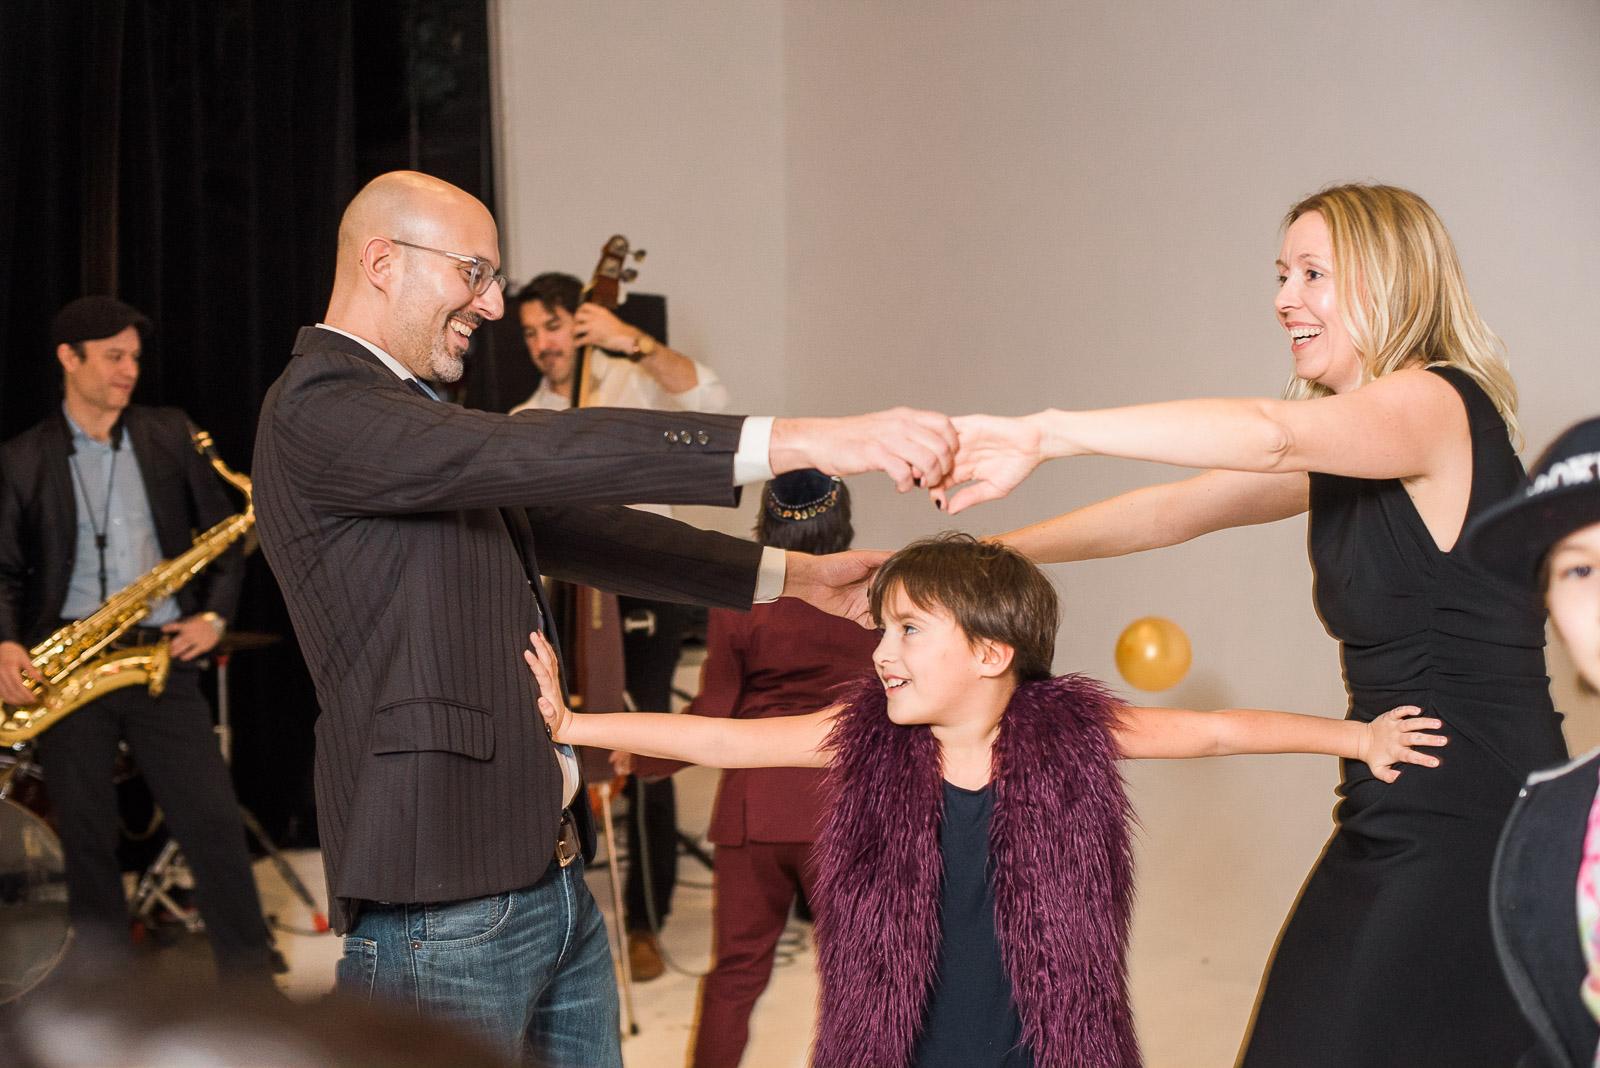 Copy of Parents dancing/Bat mitzvah photographers